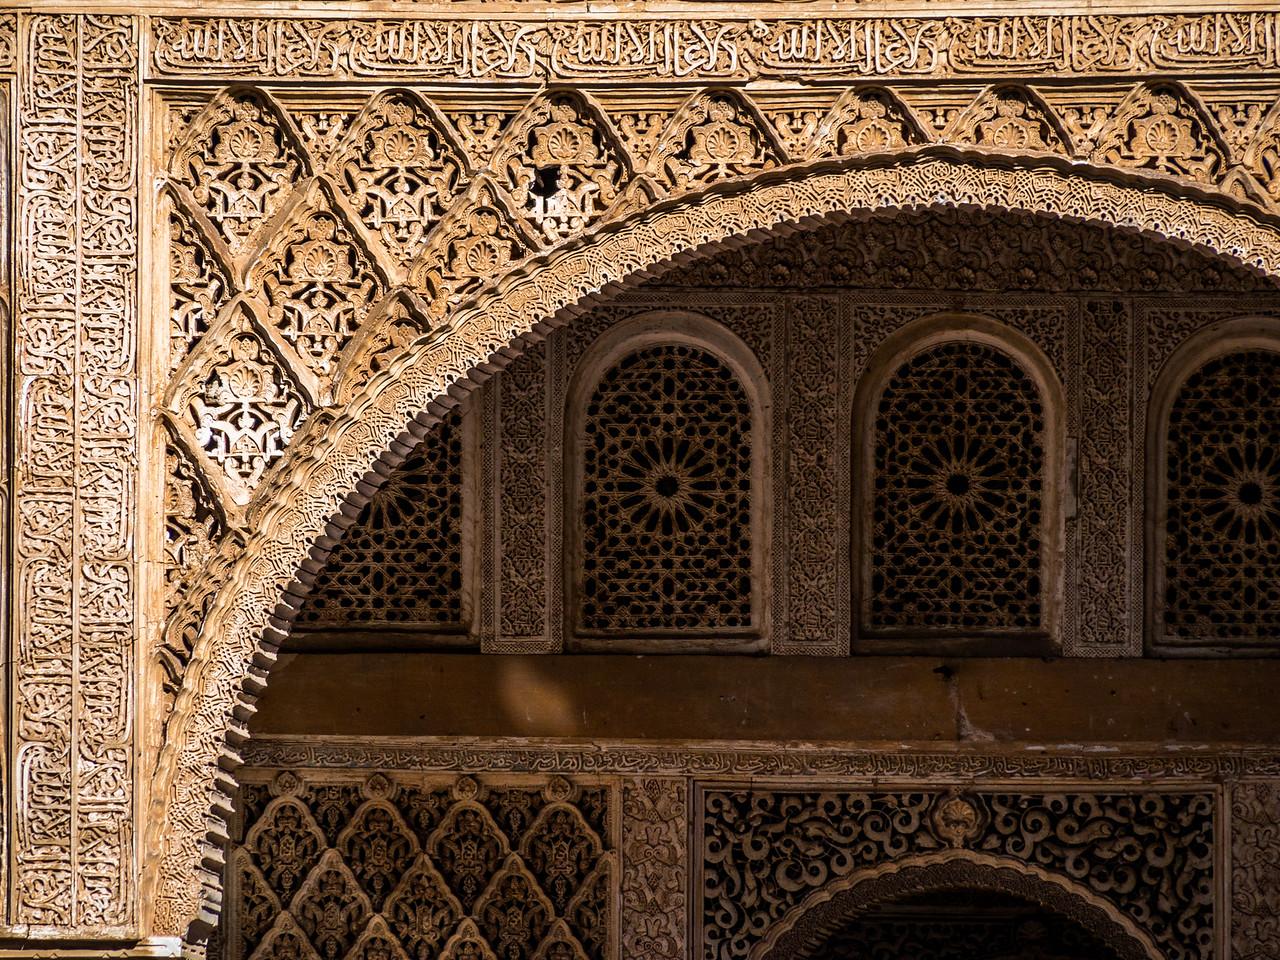 Detailed Archway, Alhambra, Granada, Spain